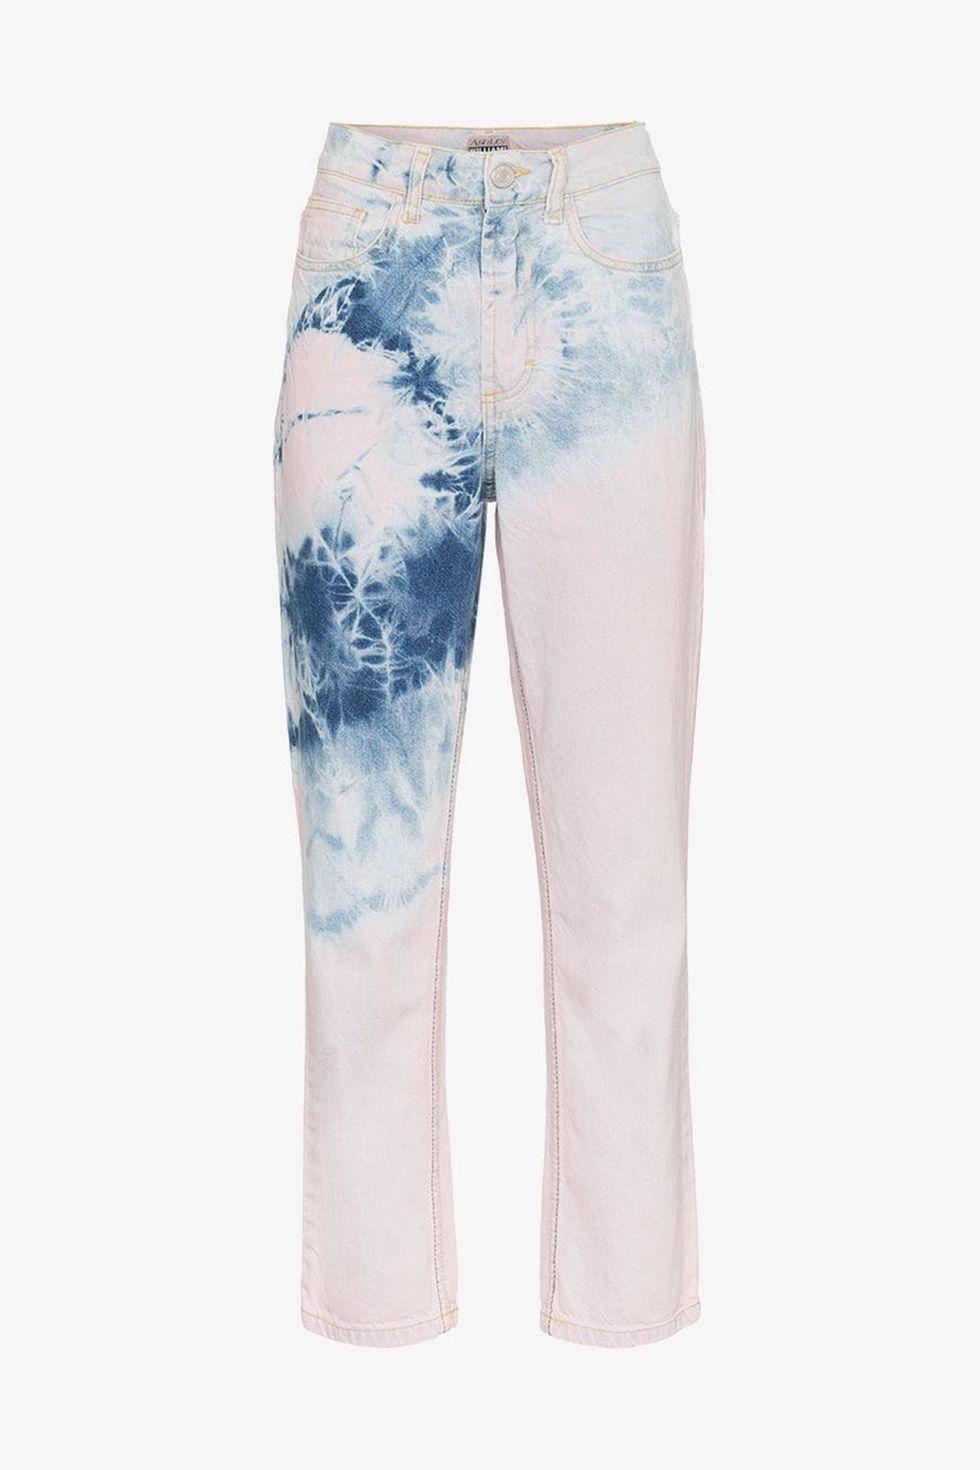 ashley-williams-high-waisted-tye-dye-jeans-